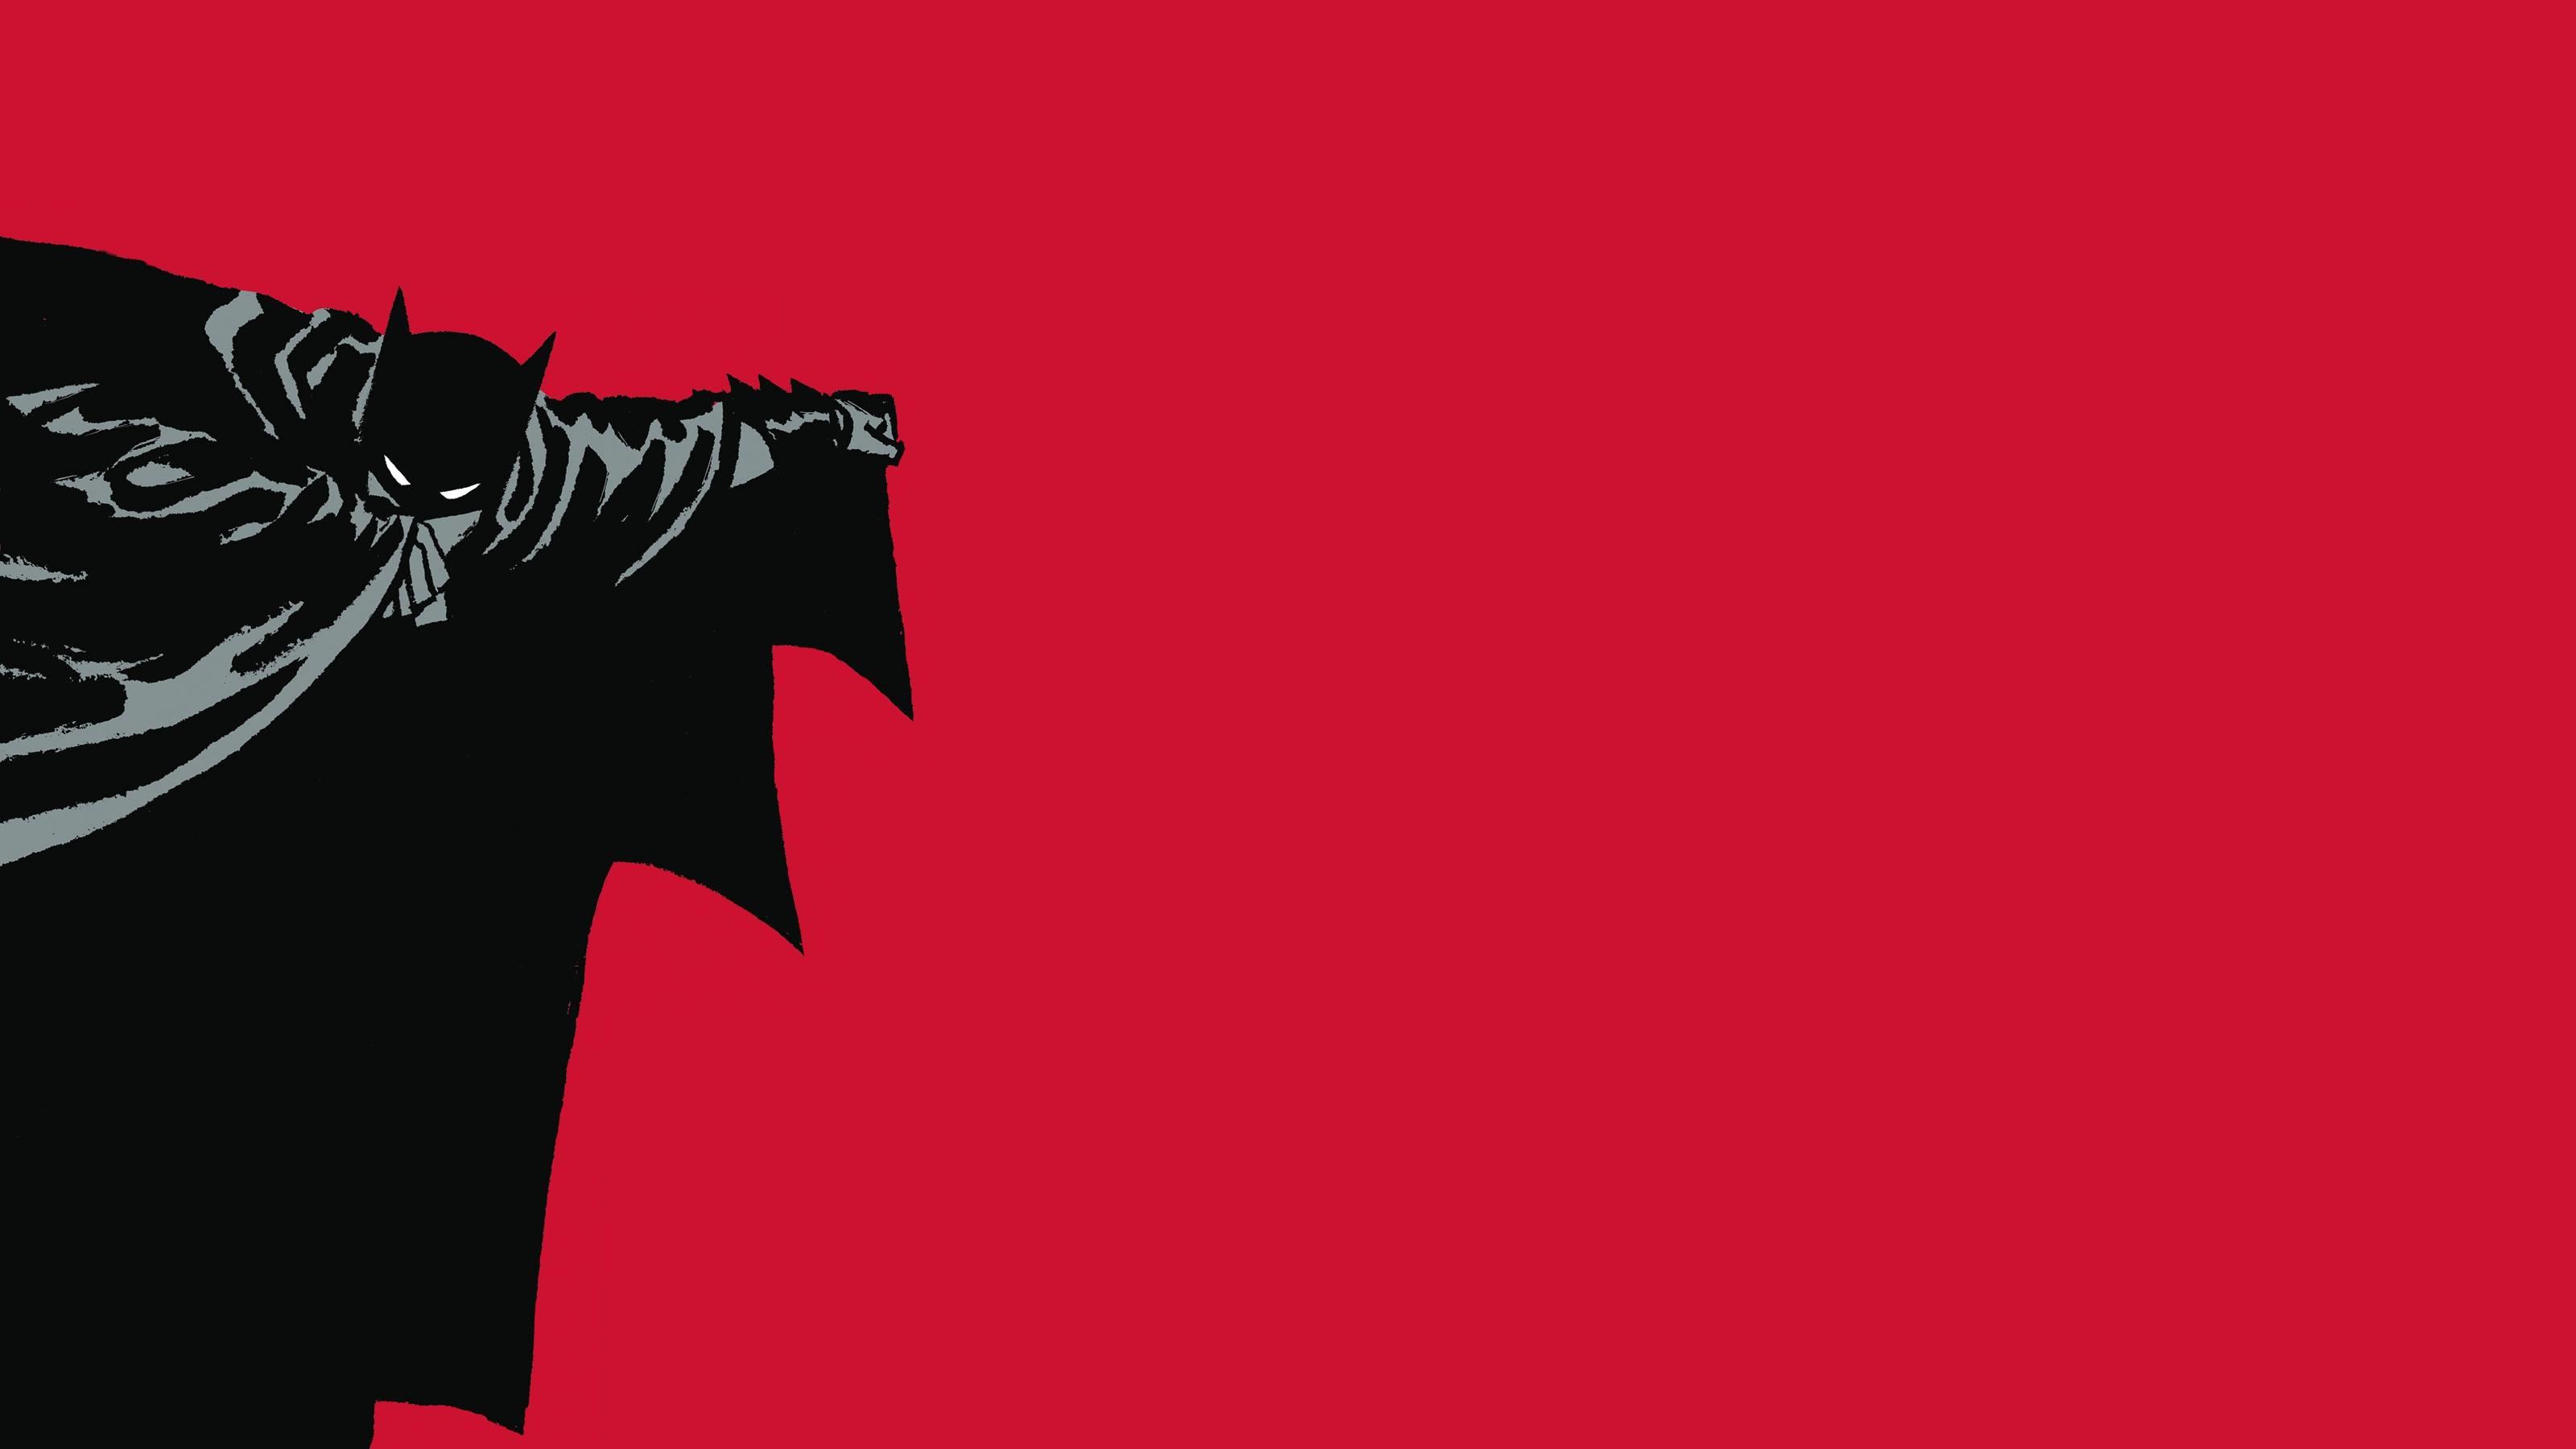 Batman full hd wallpaper and background image 3200x1800 - 3200x1800 wallpaper ...